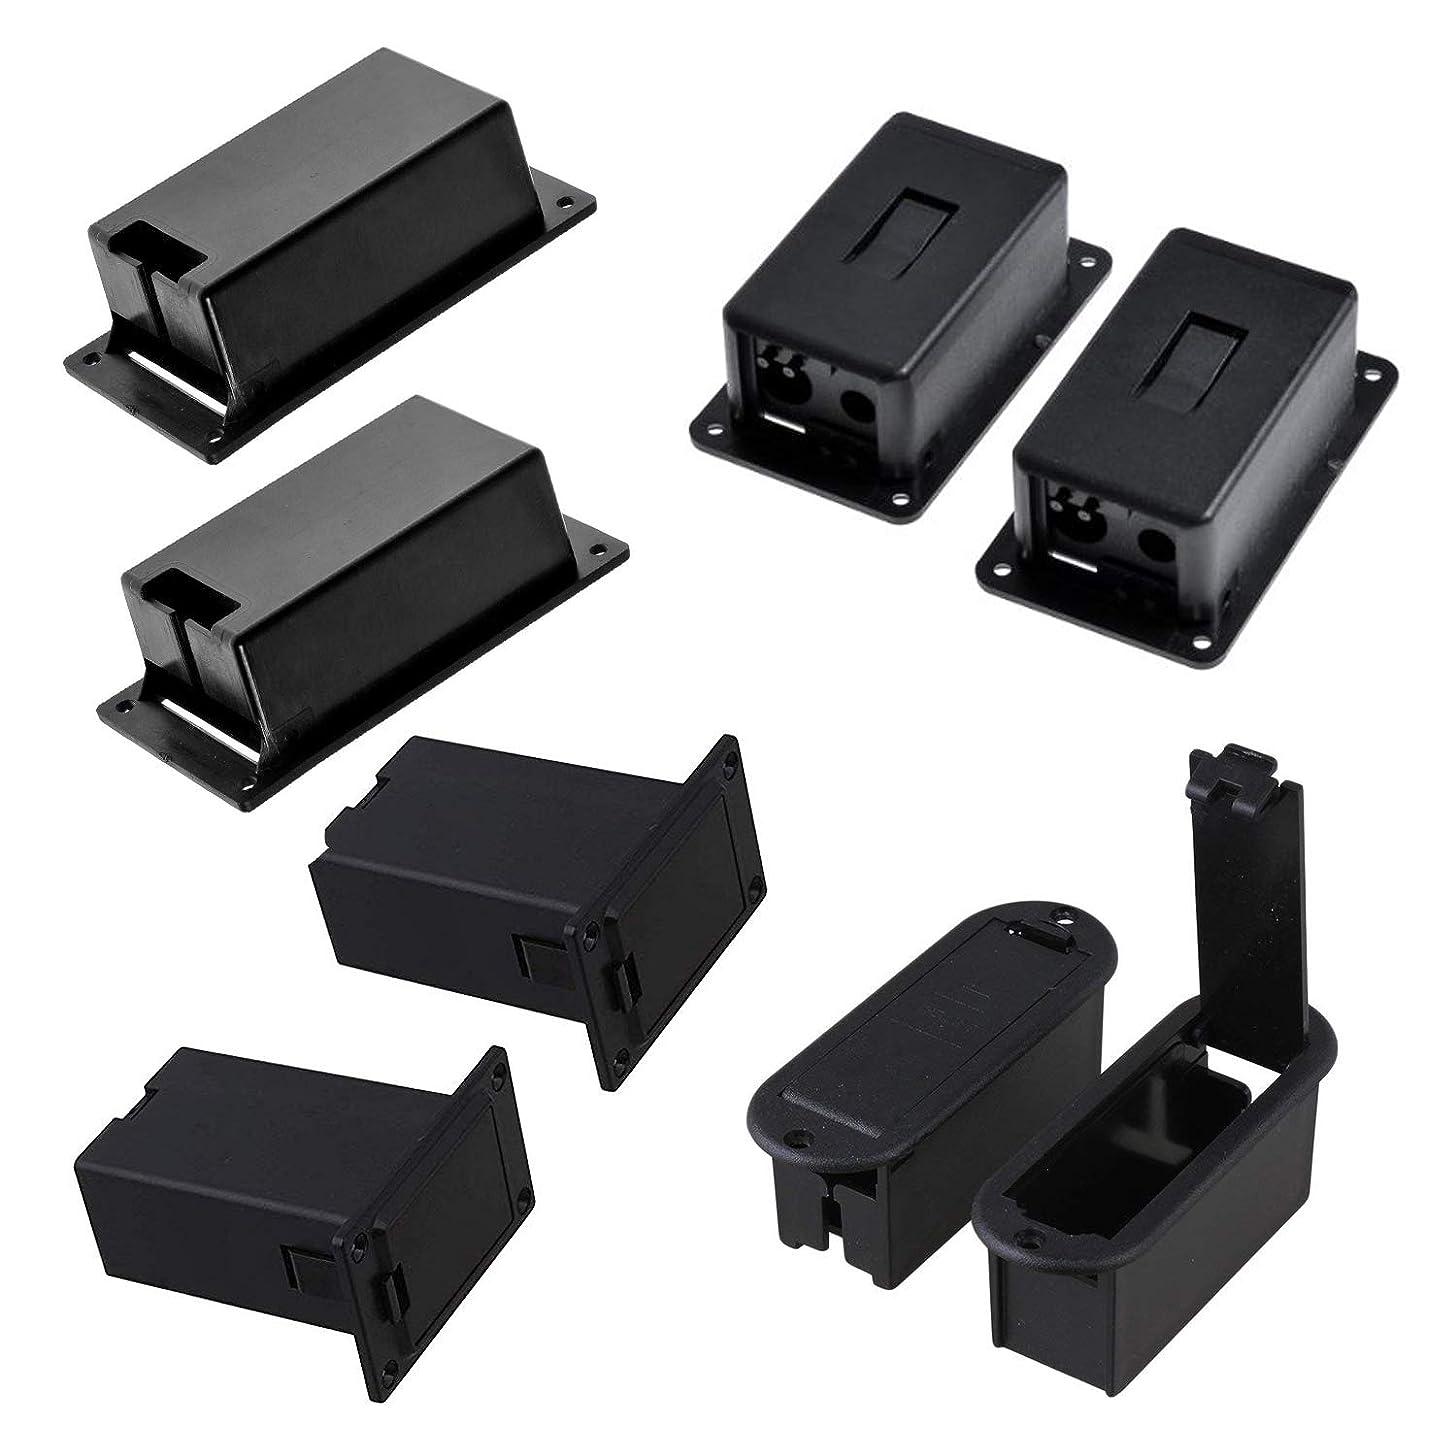 Timiy 4 Types 8pcs Black Plastic 9v Battery Holder Case BOX Base for Active Guitar Bass No Terminal